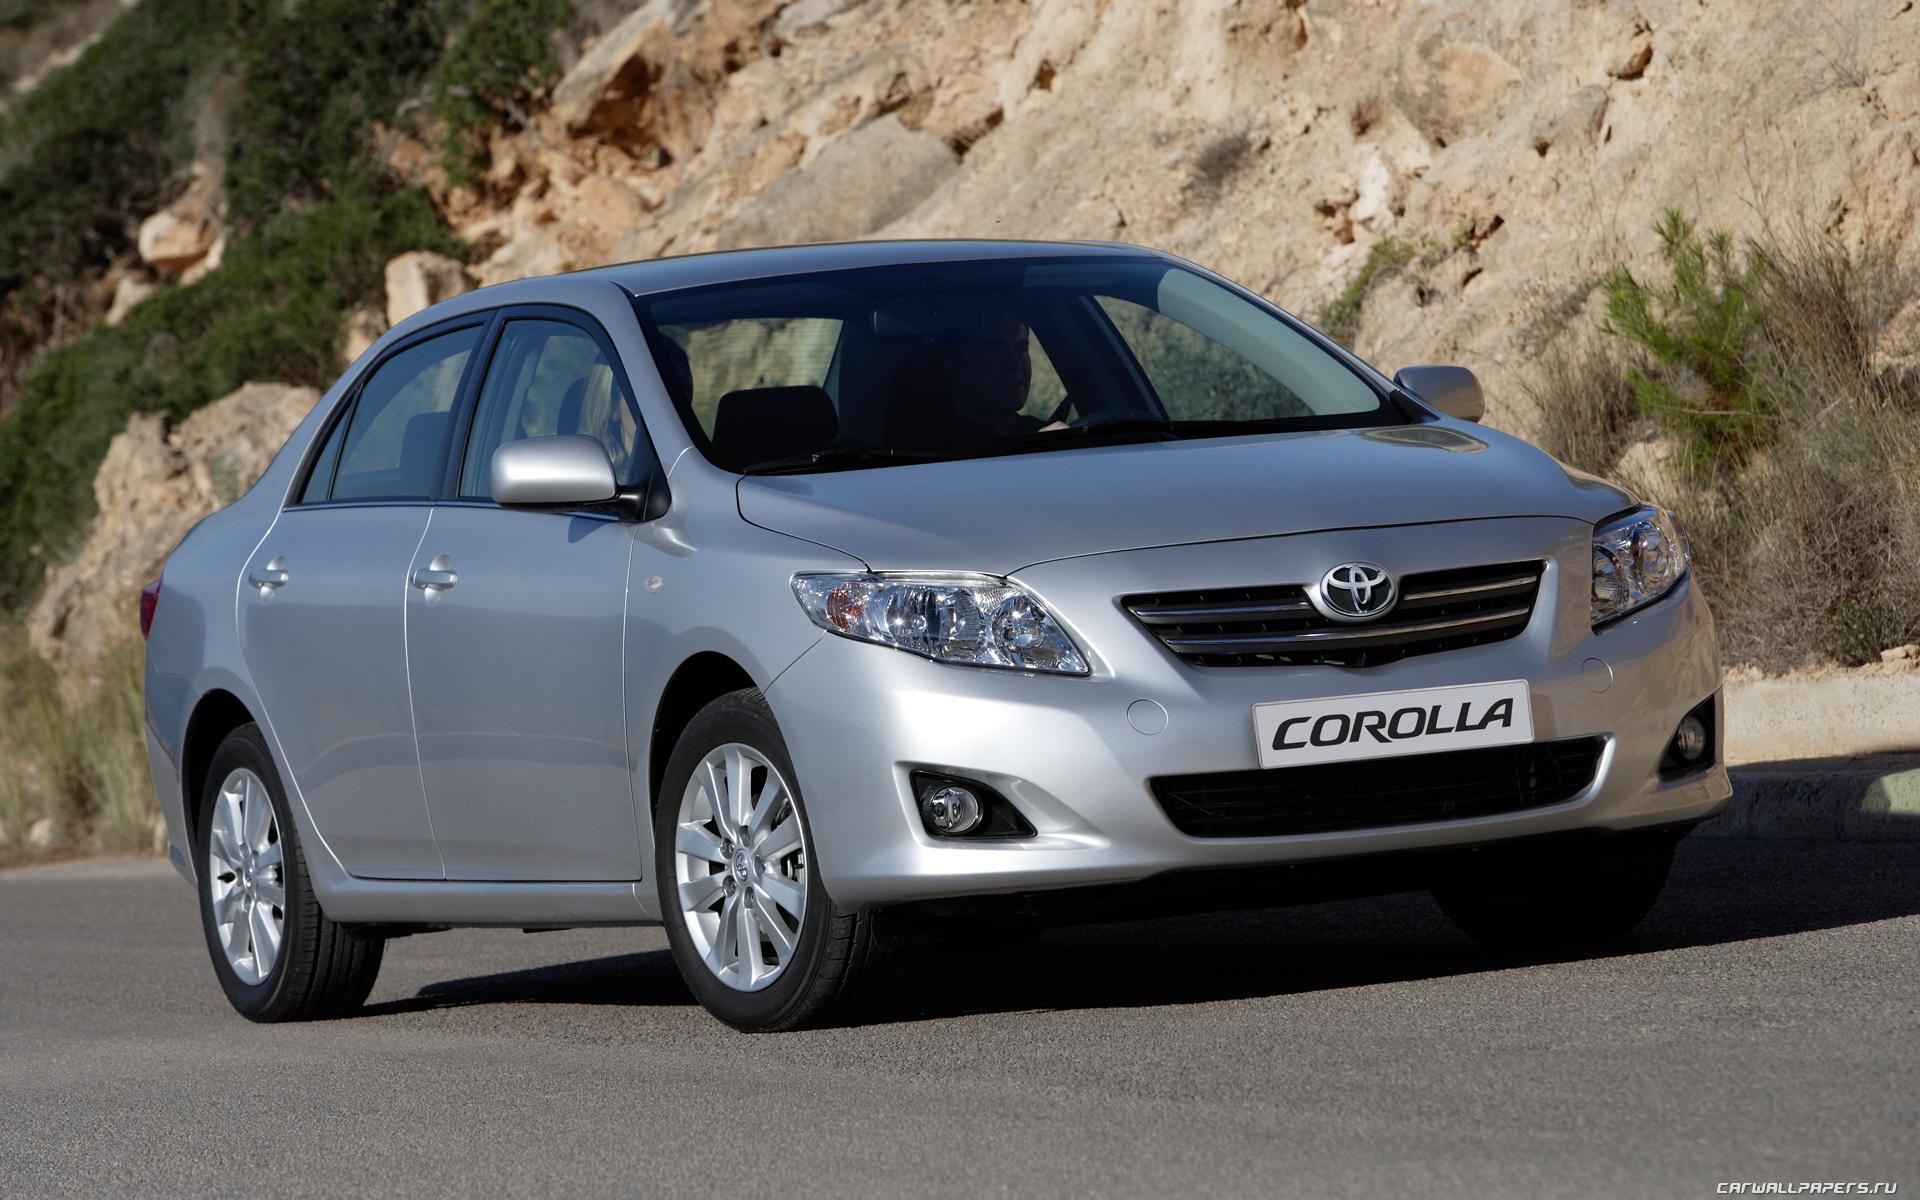 Toyota Corolla, Toyota , Toyota Corolla buy, Toyota buy